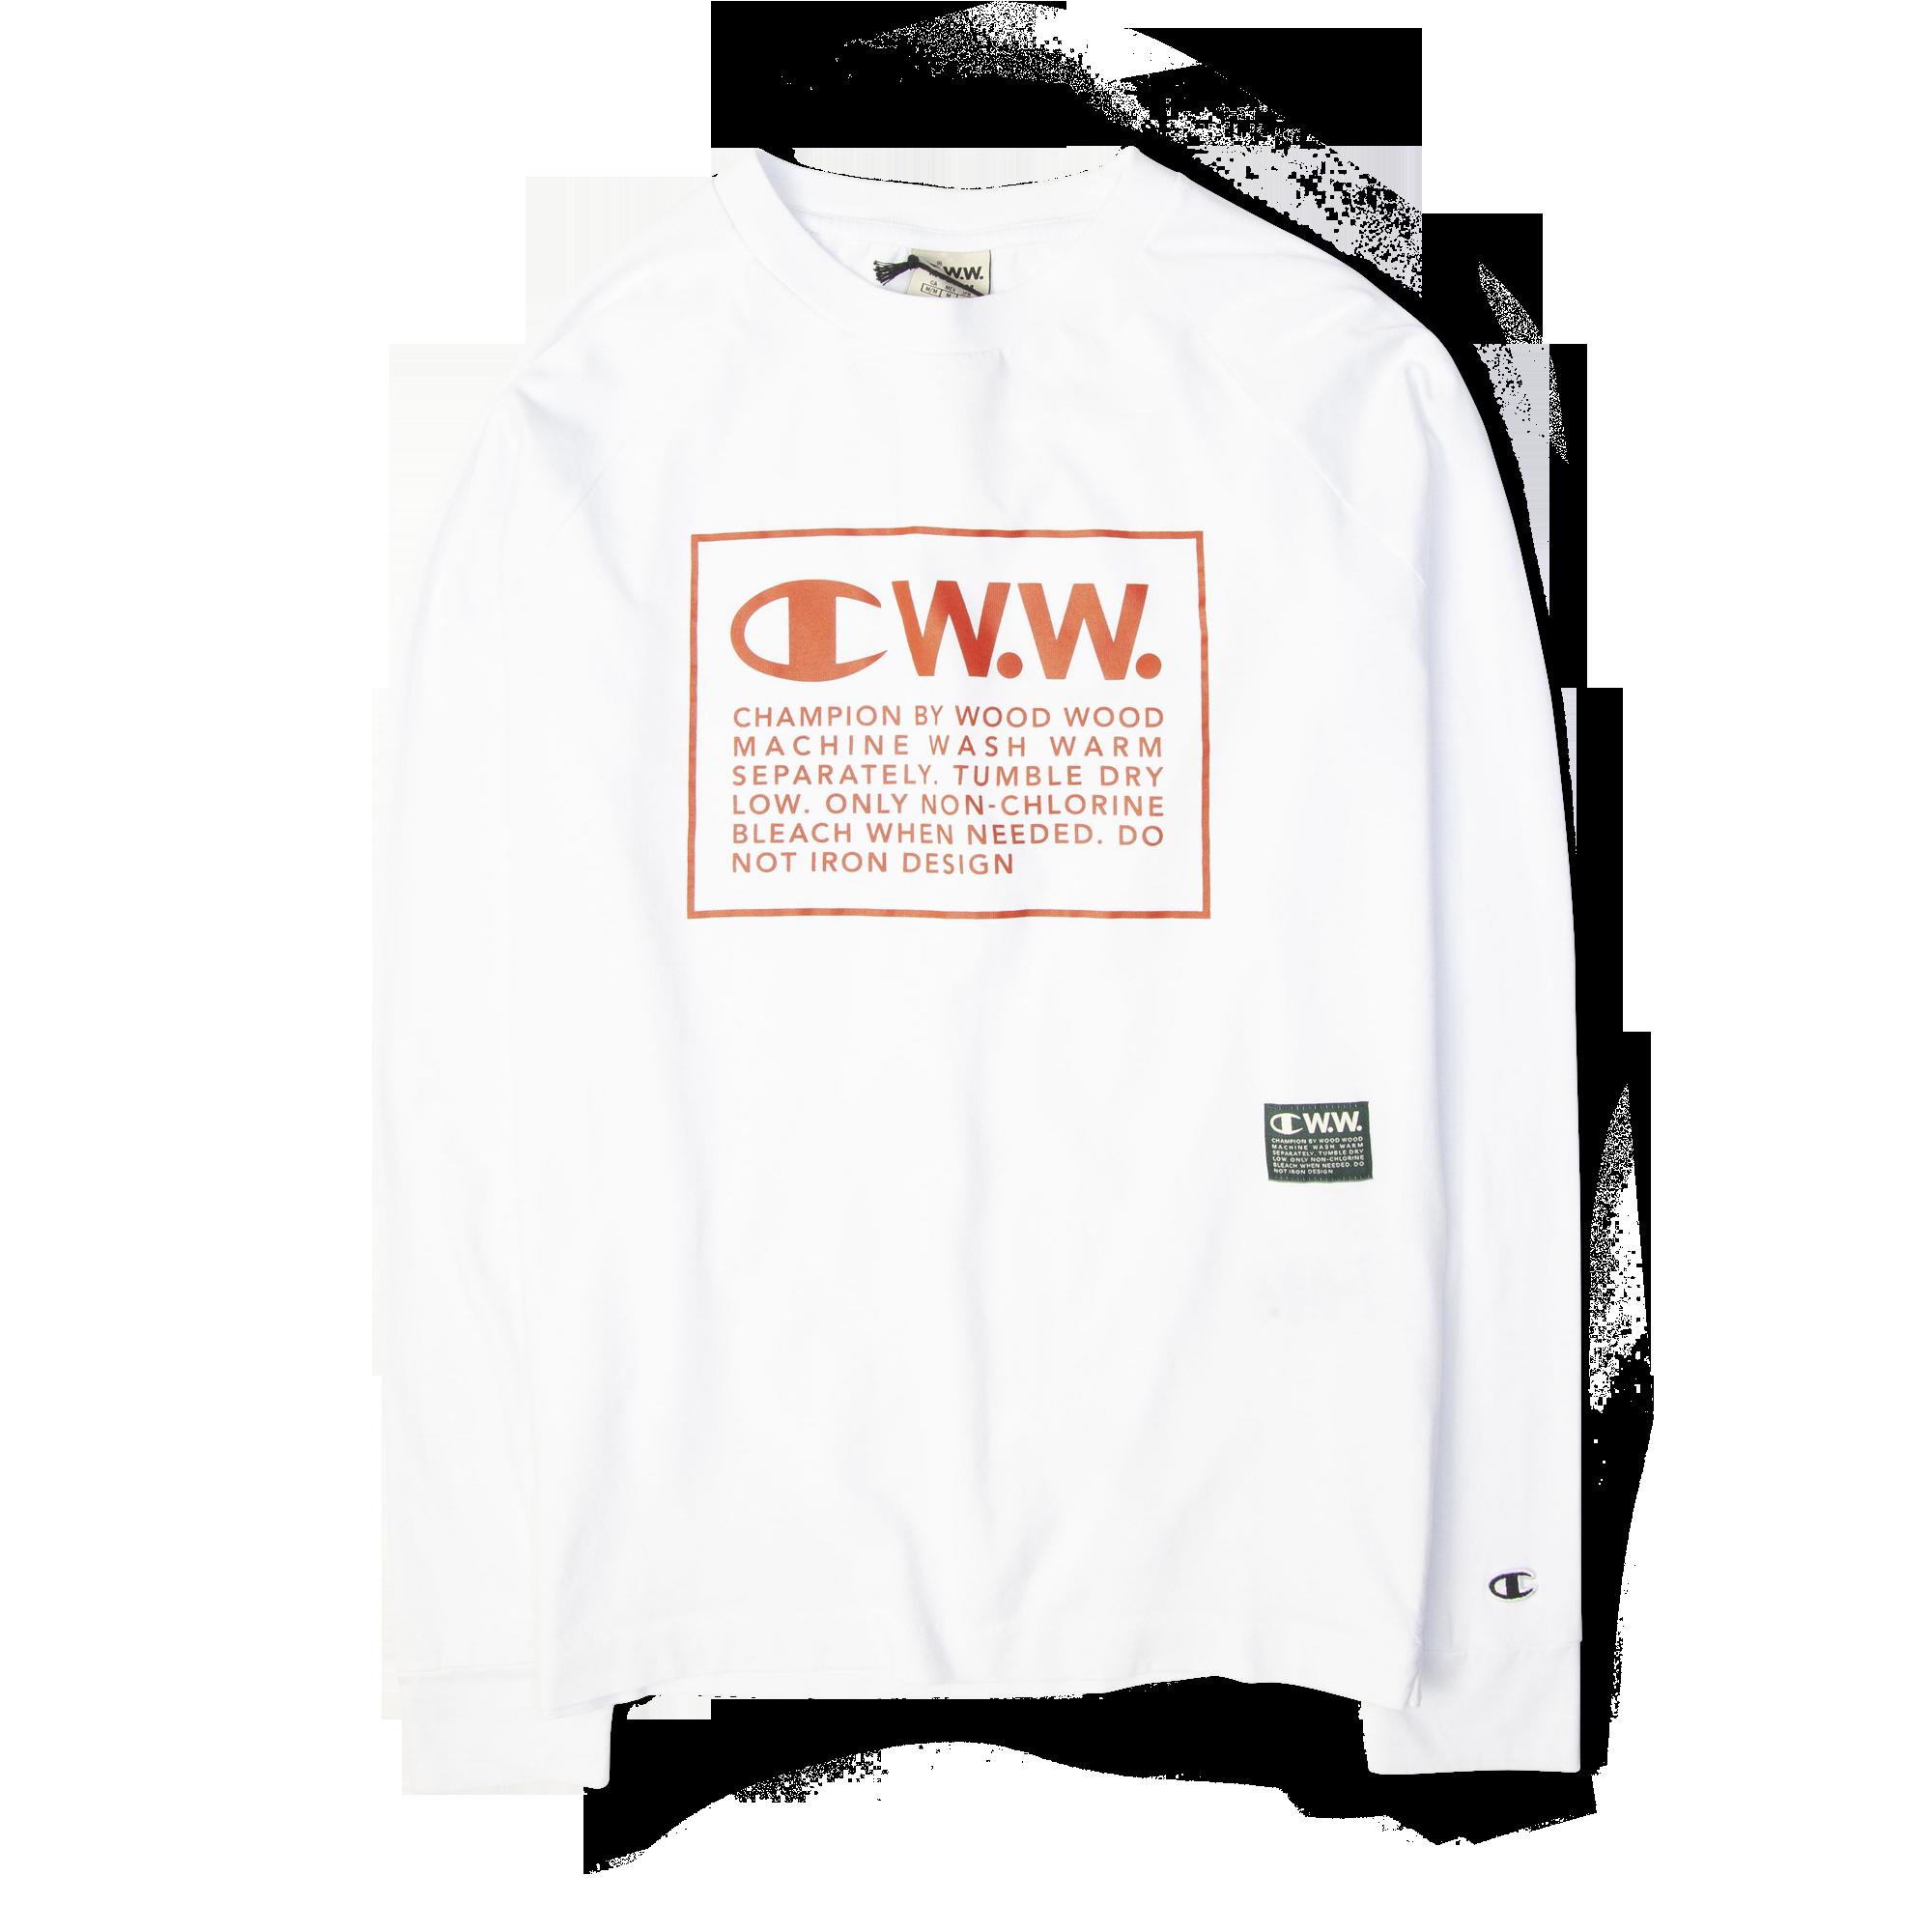 76bab5bc2448 Champion X Wood Wood Long Sleeve Box Logo Tee White Free SHIPPING OVER  £50.00 #1856 #grants1856 #grants